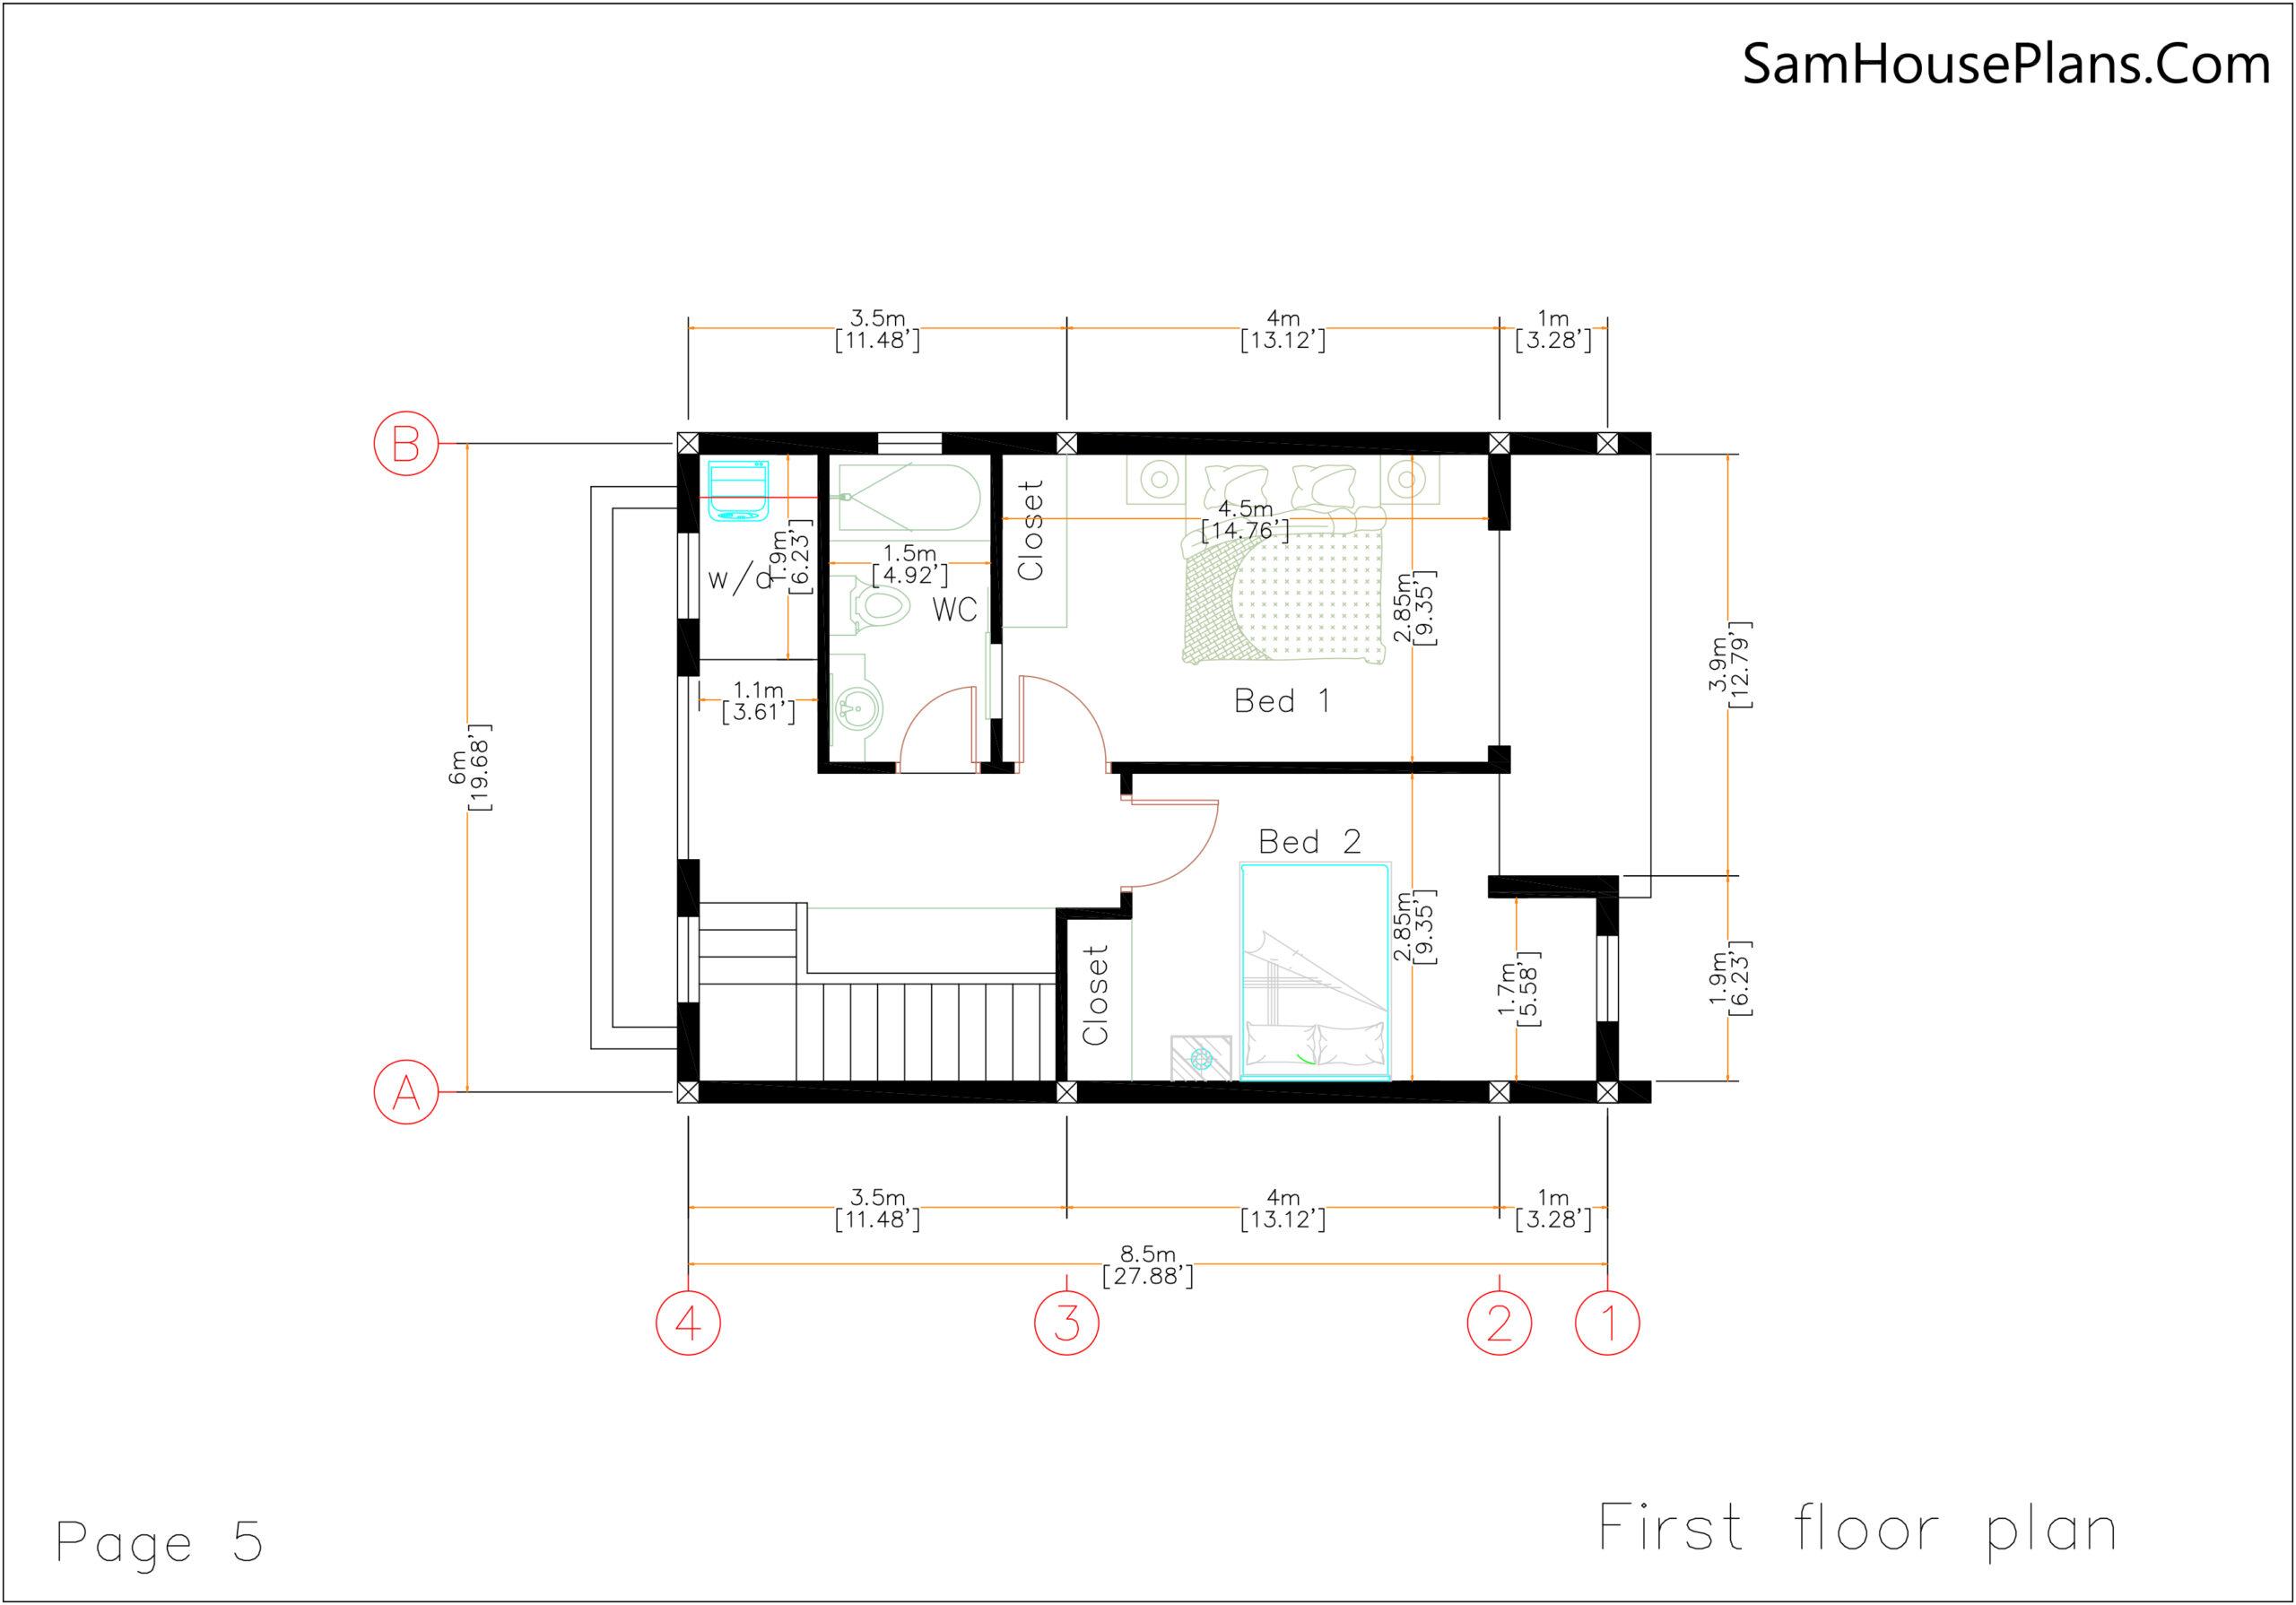 20x28 House Design Plan 6x8.5m PDF Full Plans First floor